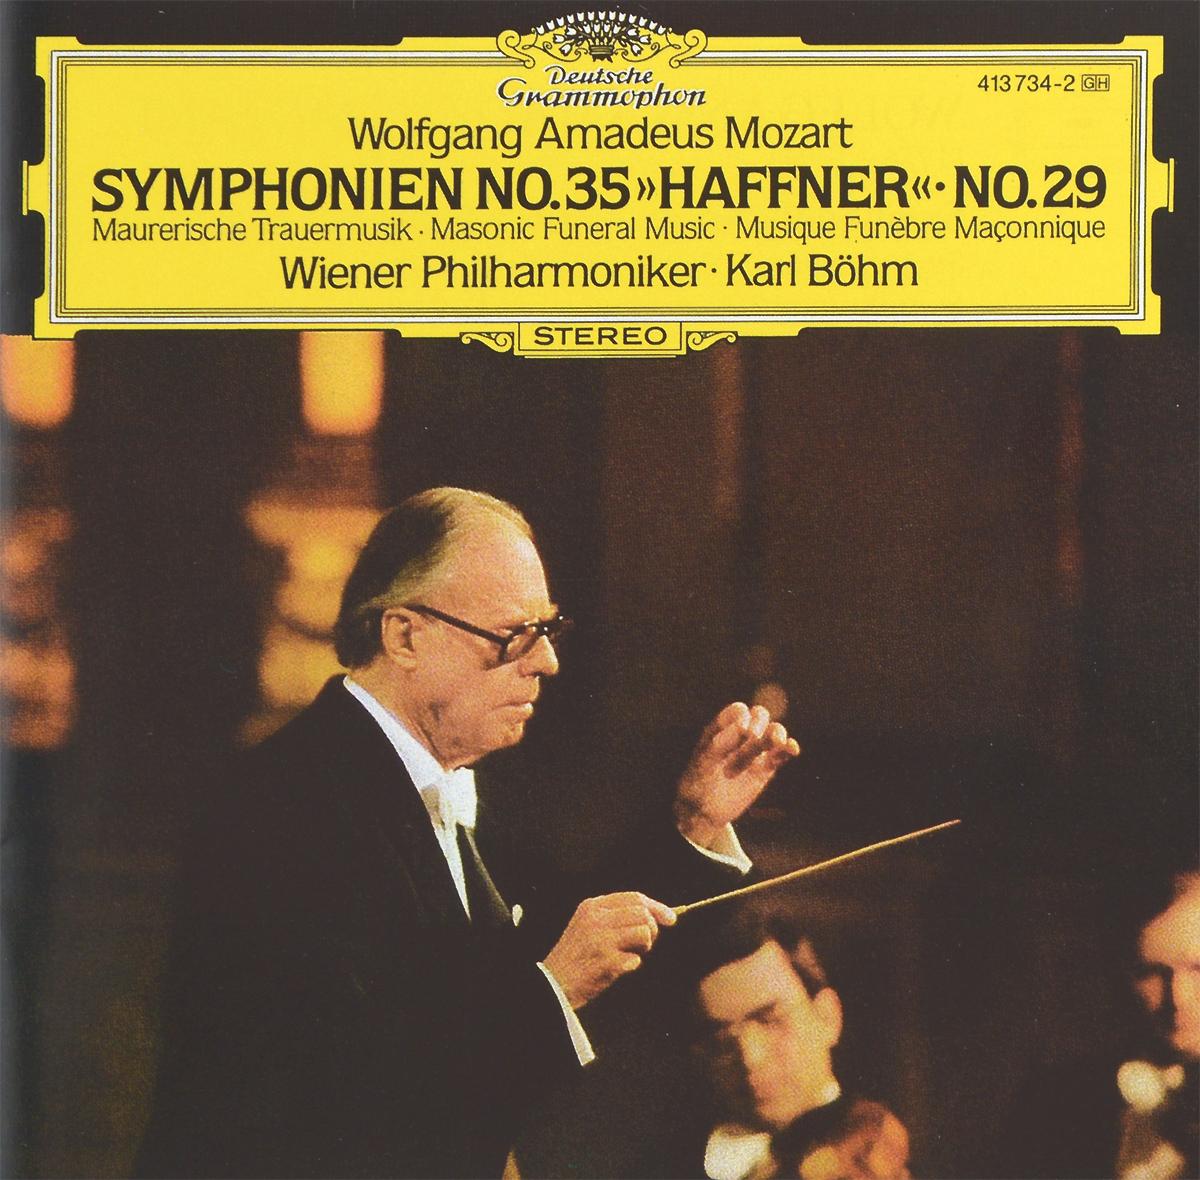 Карл Боэм,Wiener Philharmoniker Karl Boehm. Wolfgang Amadeus Mozart. Symphonien No. 35 Haffner / No. 29 münchner philharmoniker elbphilharmonie hamburg